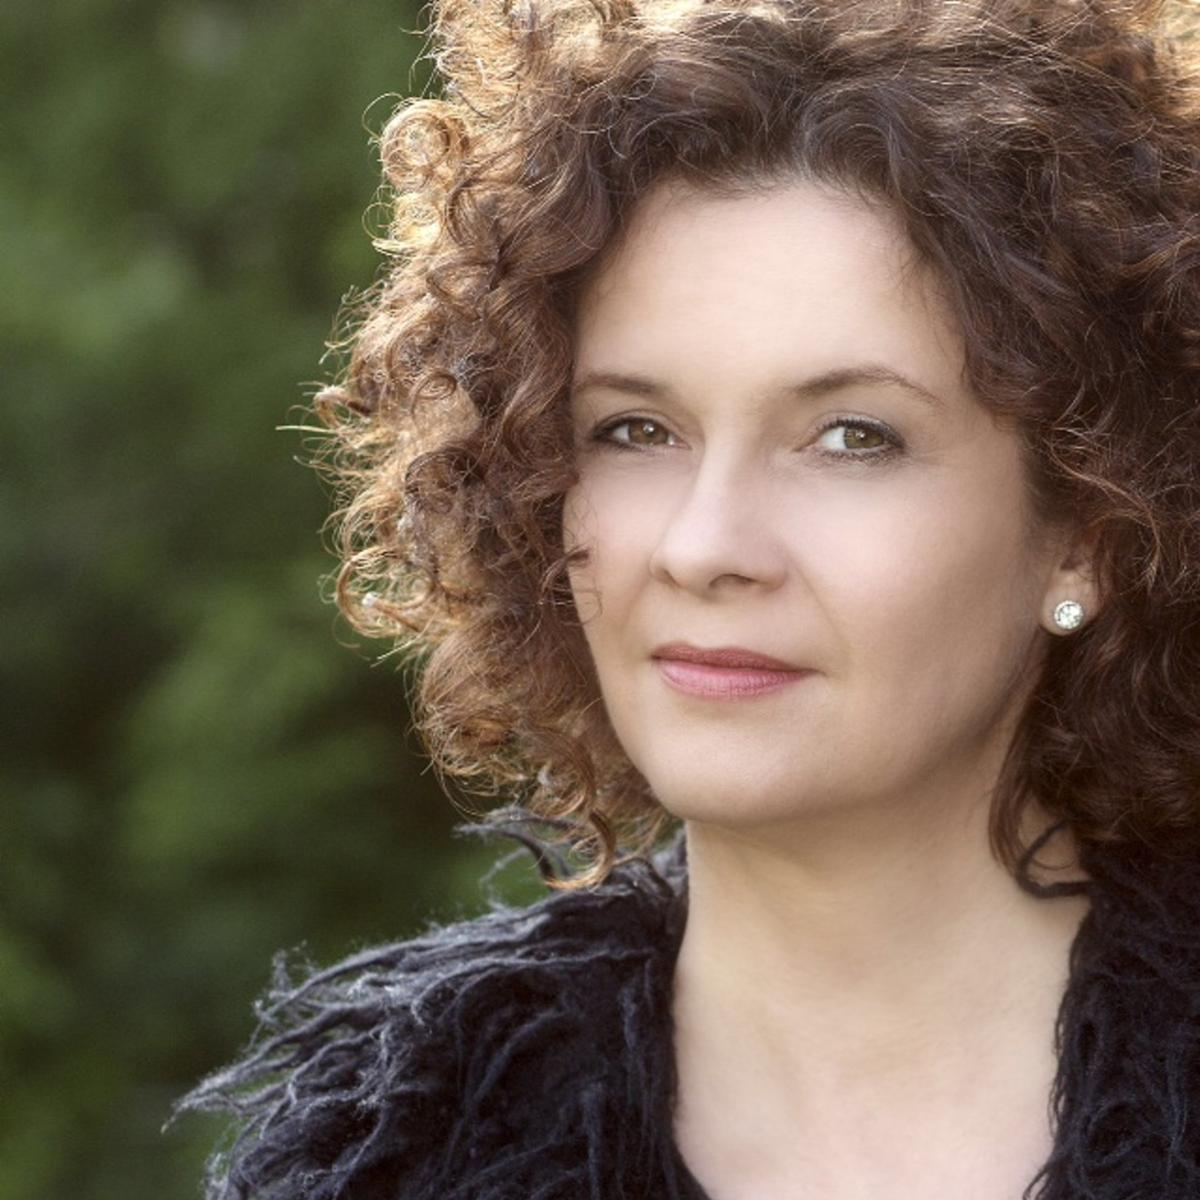 Meisterkurs mit Angelika Kirchschlager